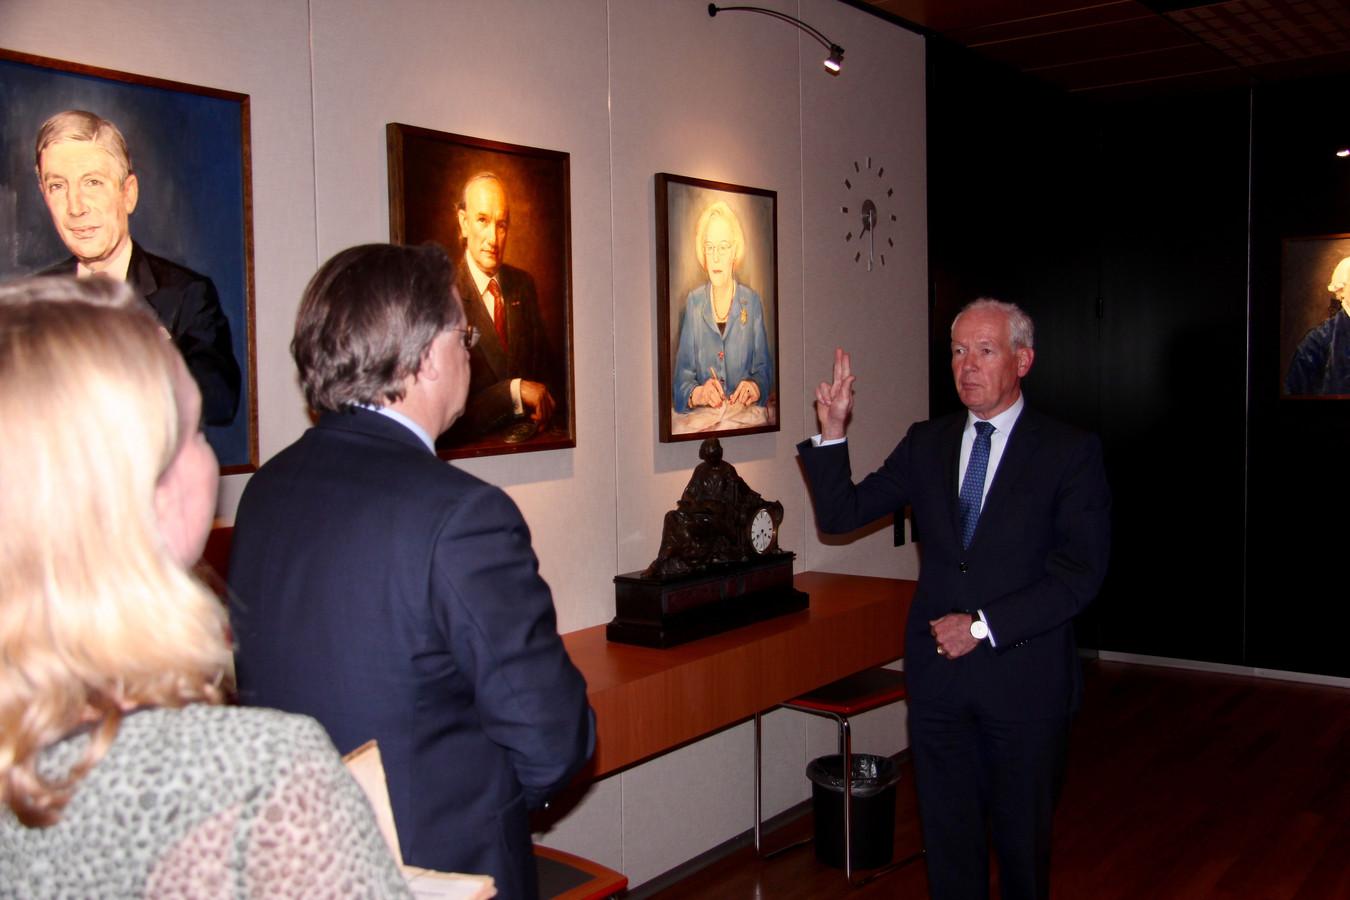 Burgemeester Peter Maas legt de eed af